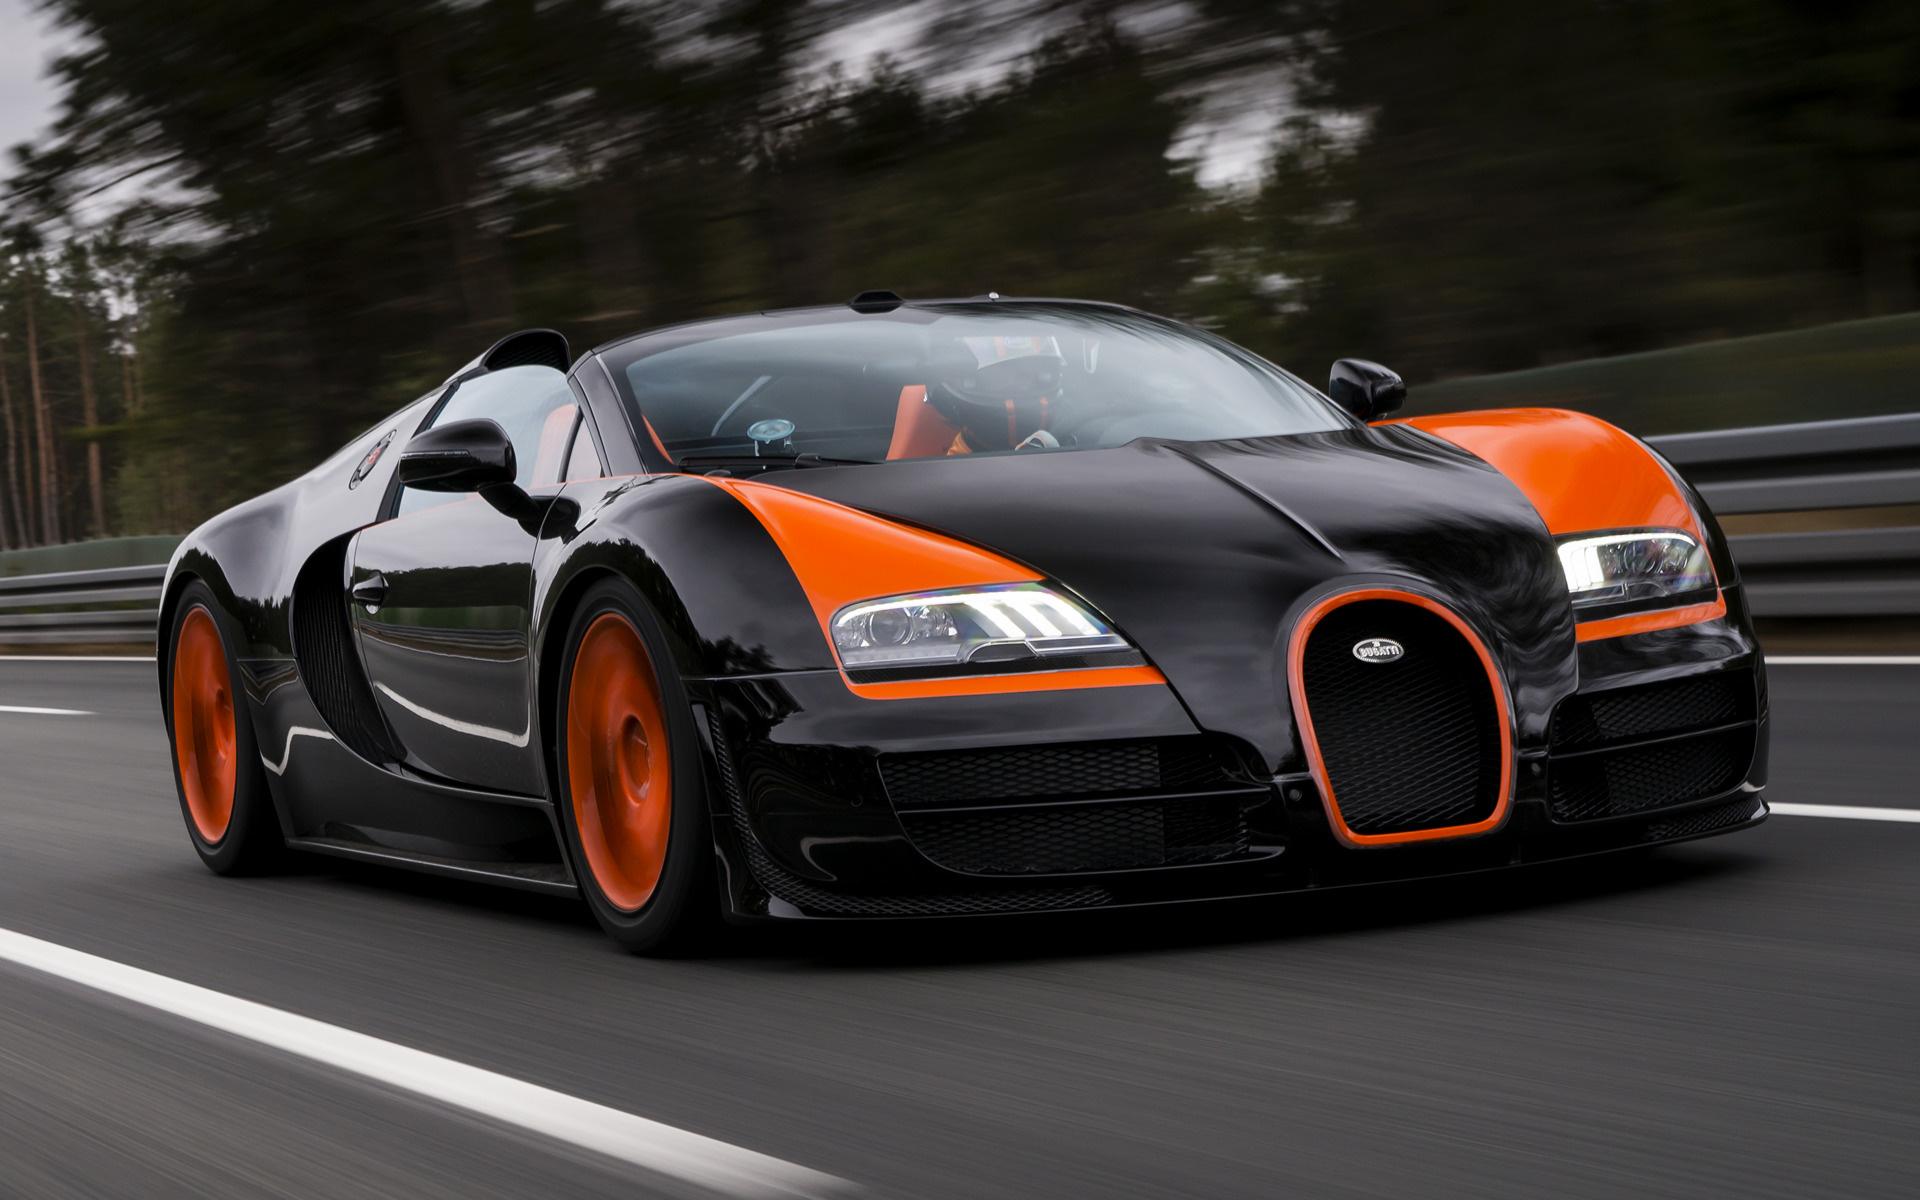 bugatti-veyron-grand-sport-vitesse-wrc-edition-car-wallpaper-41134 Gorgeous Bugatti Veyron Grand Sport Vitesse Bleu Cars Trend